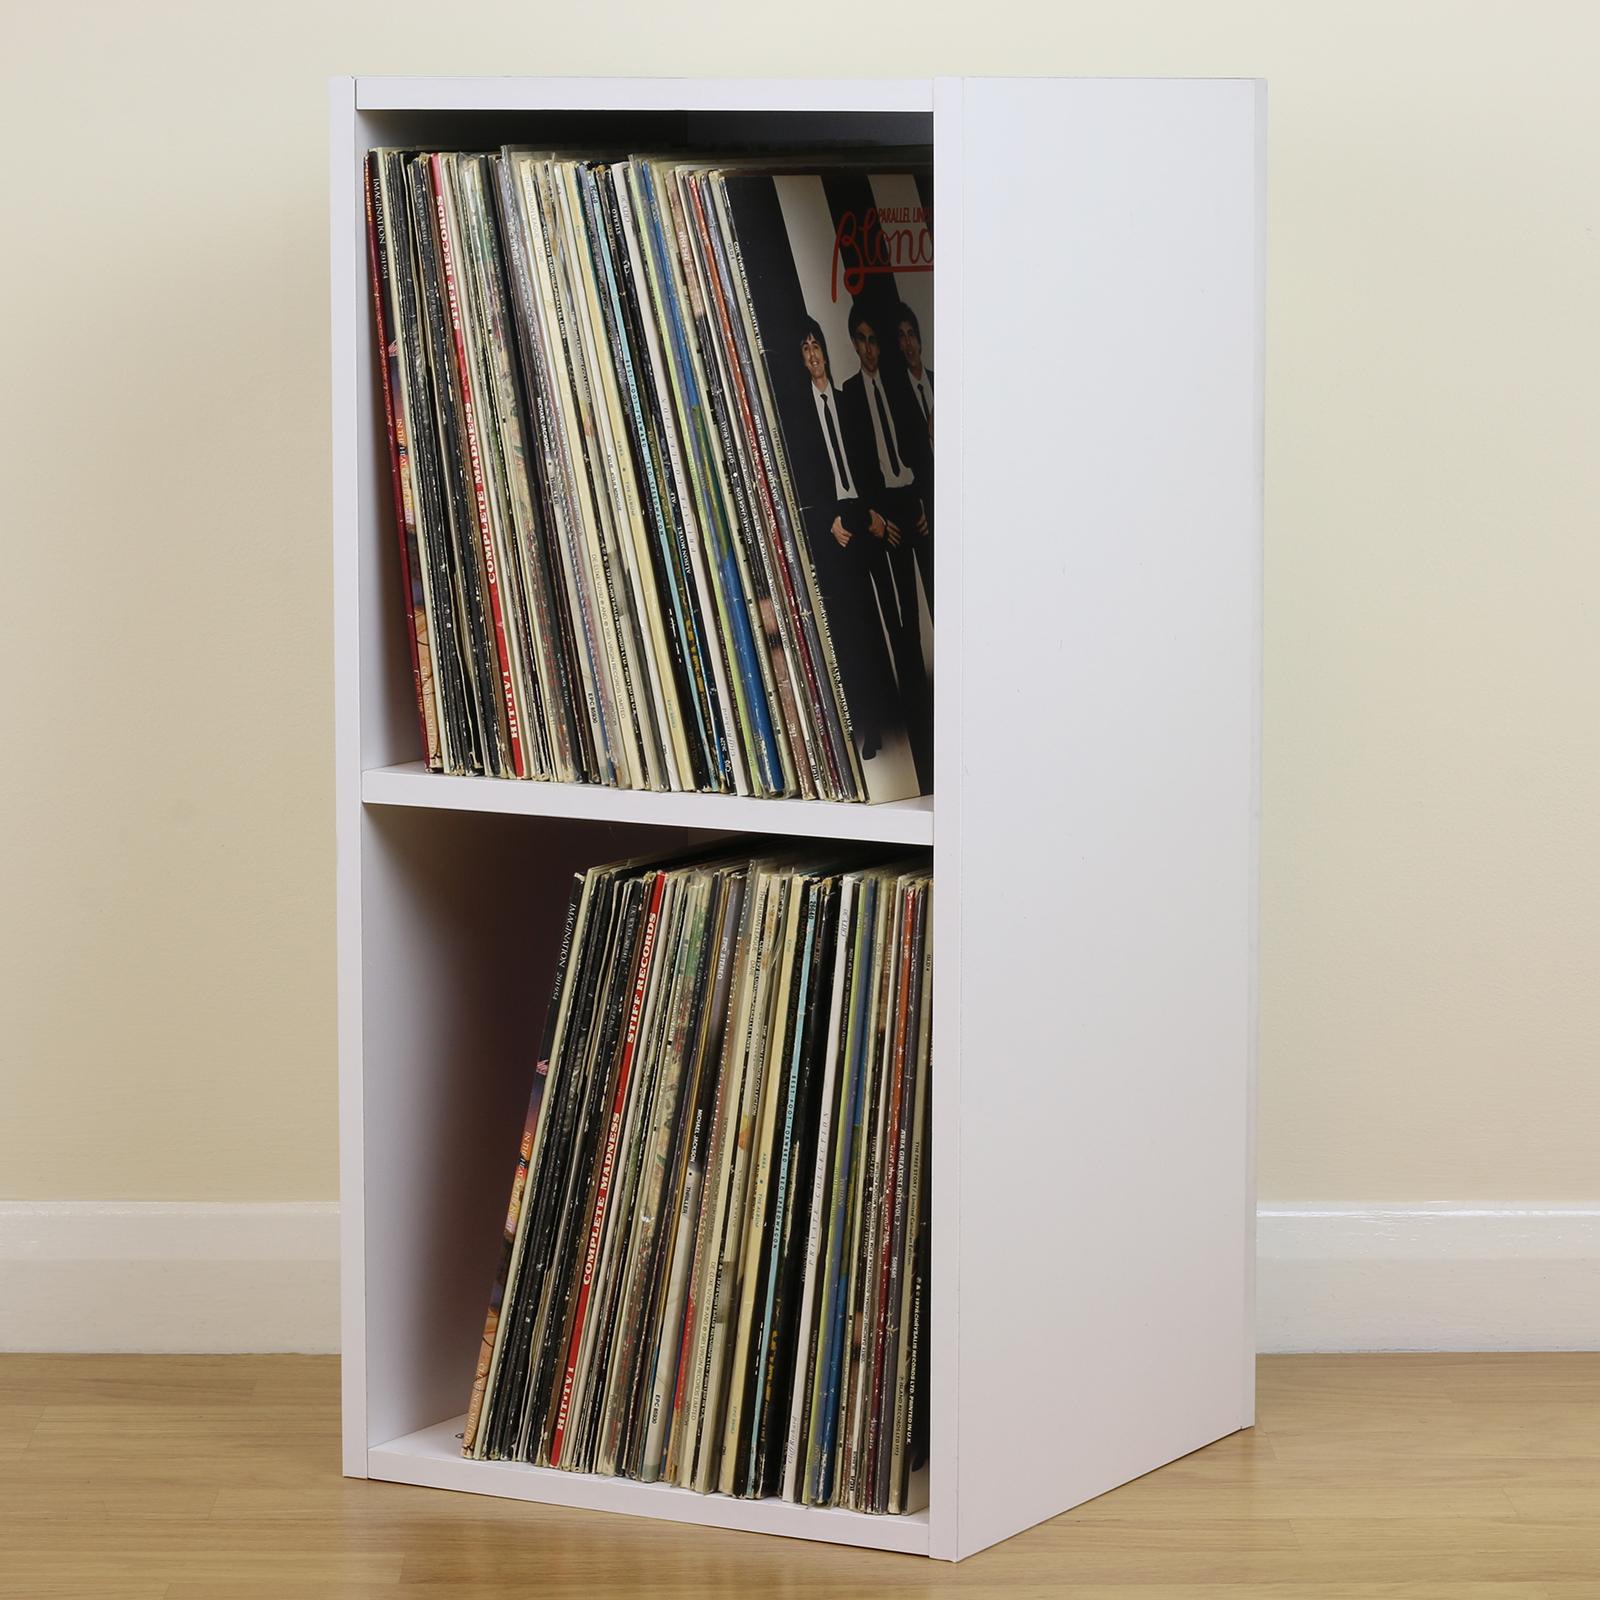 lp storage furniture. Sentinel Large White Square LP/Vinyl Music Record Storage Cube/Cabinet Home Display Unit Lp Furniture